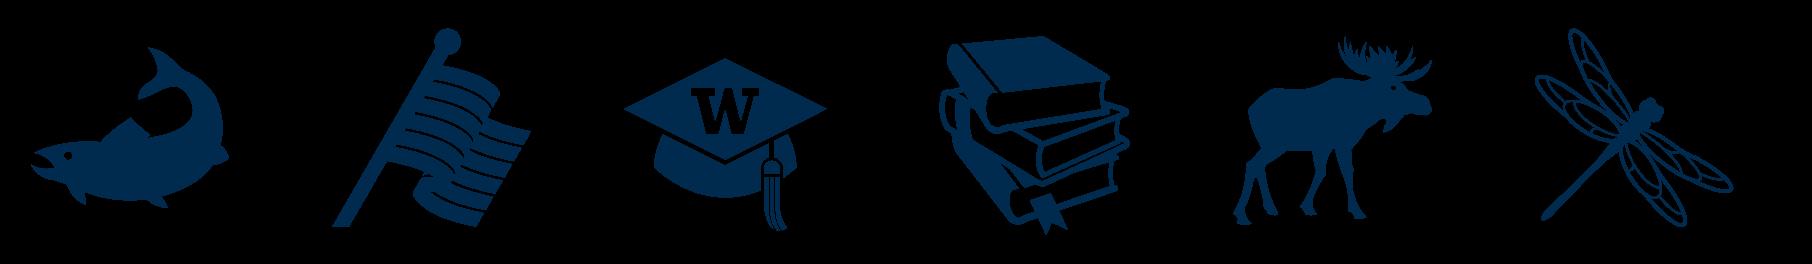 pictograms-design-seattle-transit-light-rail